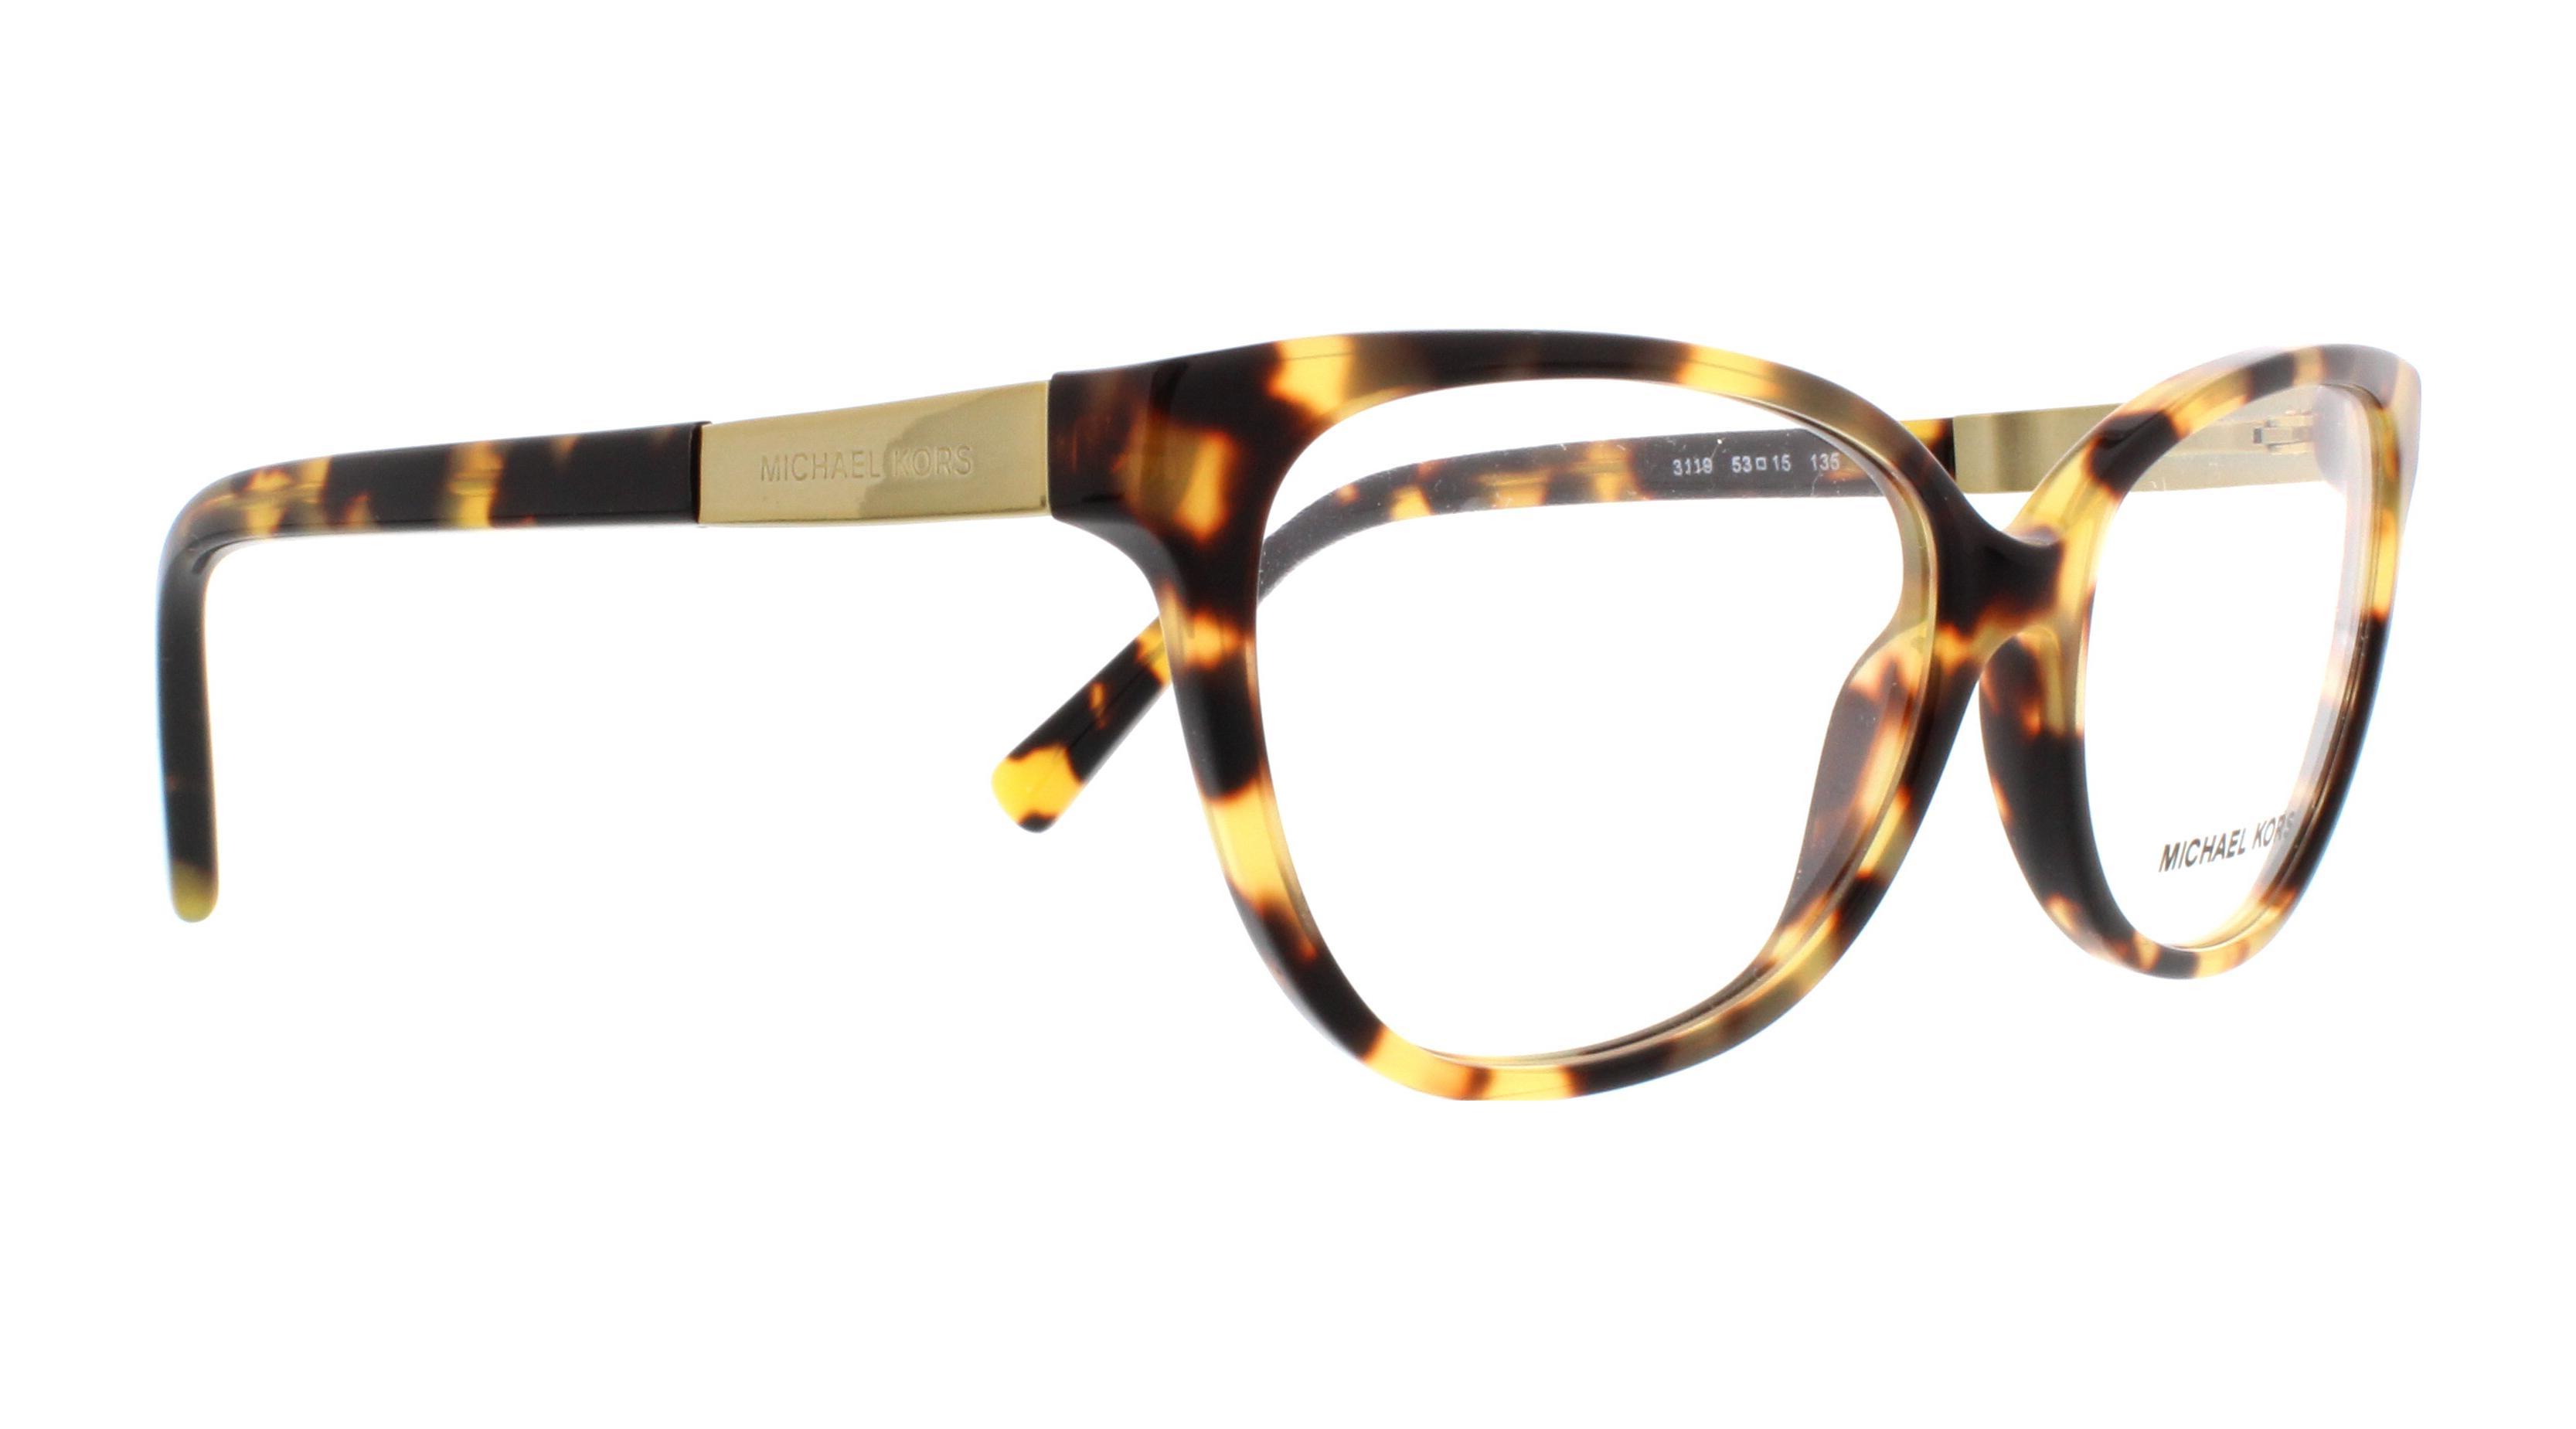 b027c87566f0 Designer Frames Outlet. Michael Kors MK4029 Adelaide III